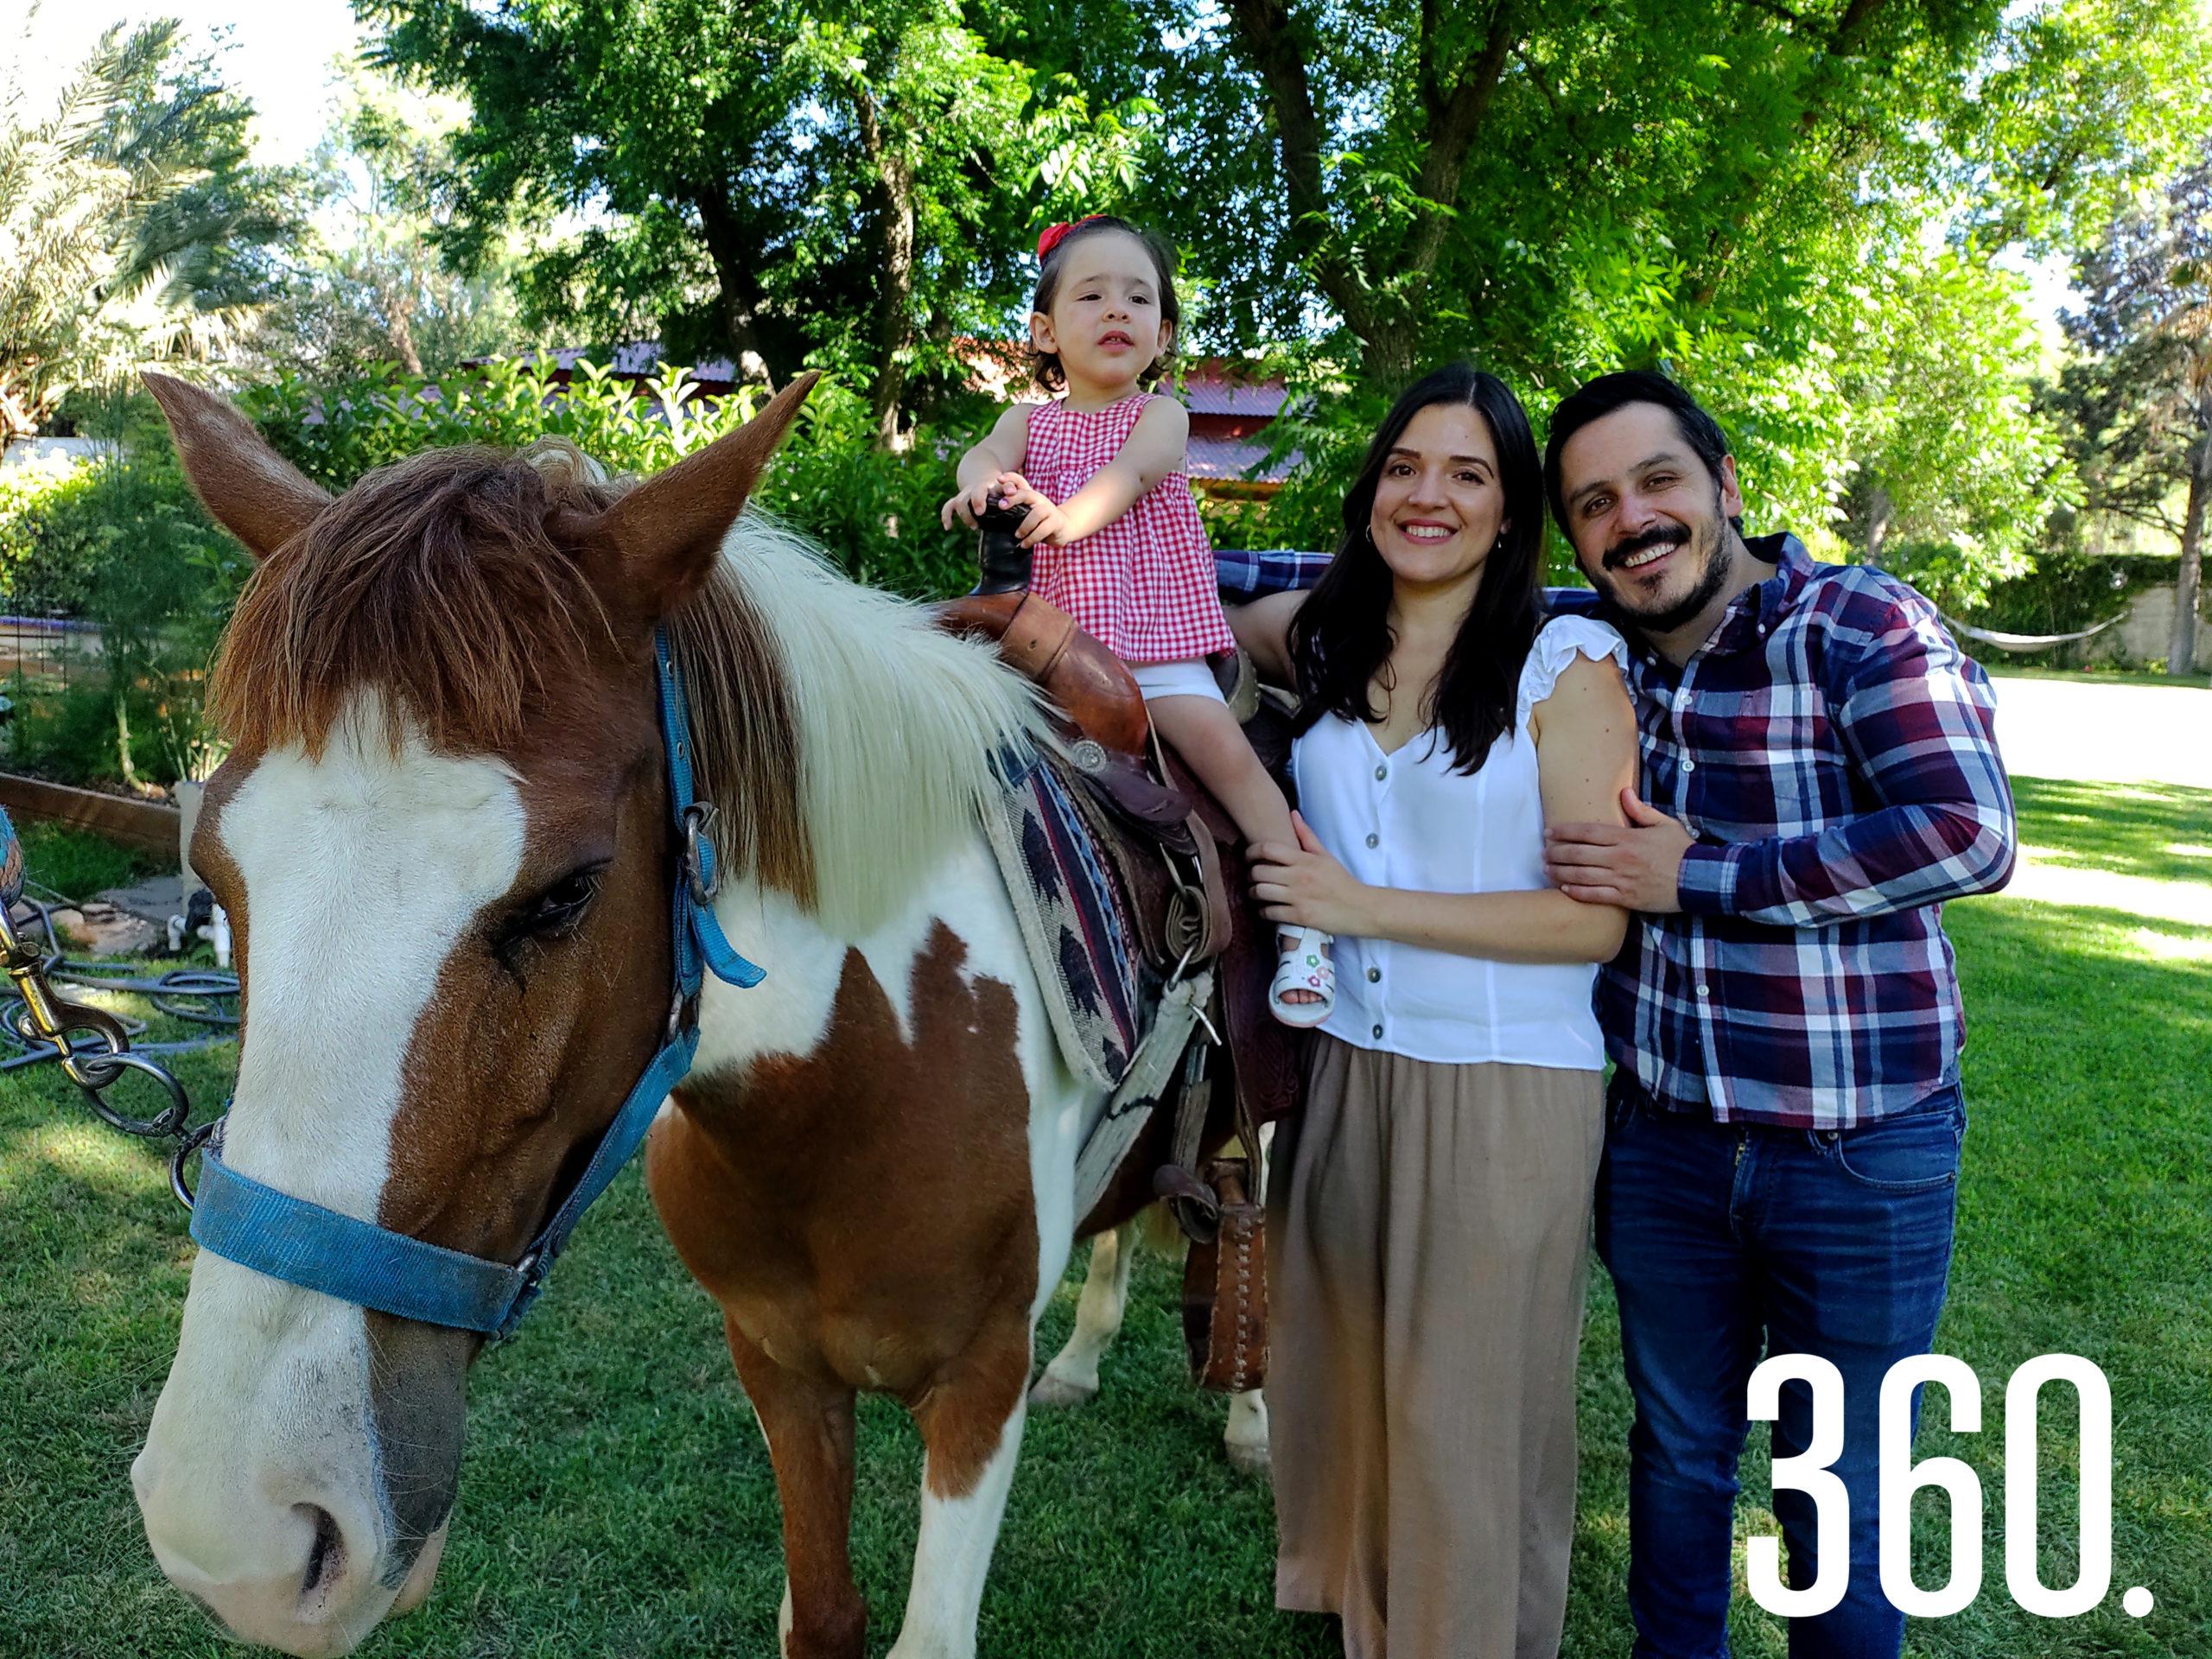 Matute Colmenero y Ana Guajardo de Valle organizaron el festejo para su hija Regina.